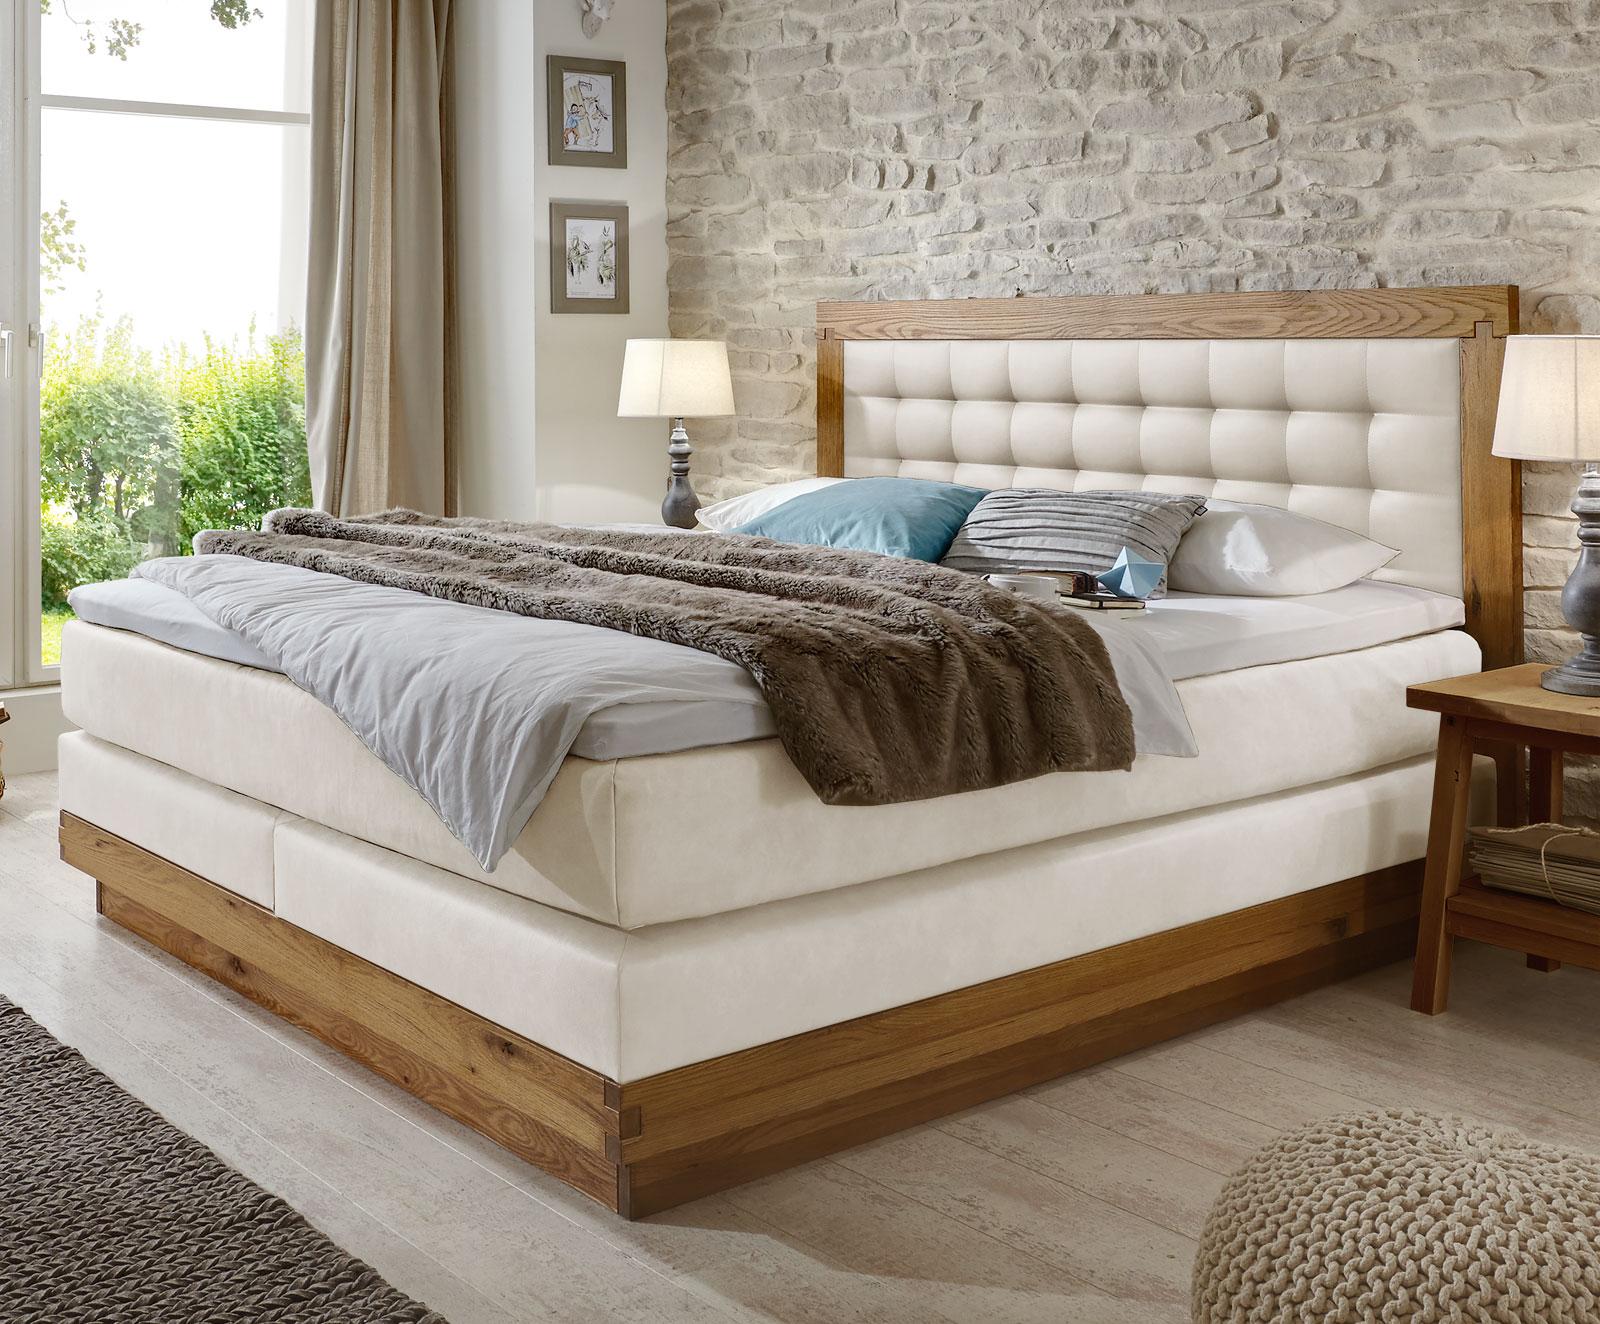 boxspringbett aus massiver wildeiche kunstleder galicia. Black Bedroom Furniture Sets. Home Design Ideas